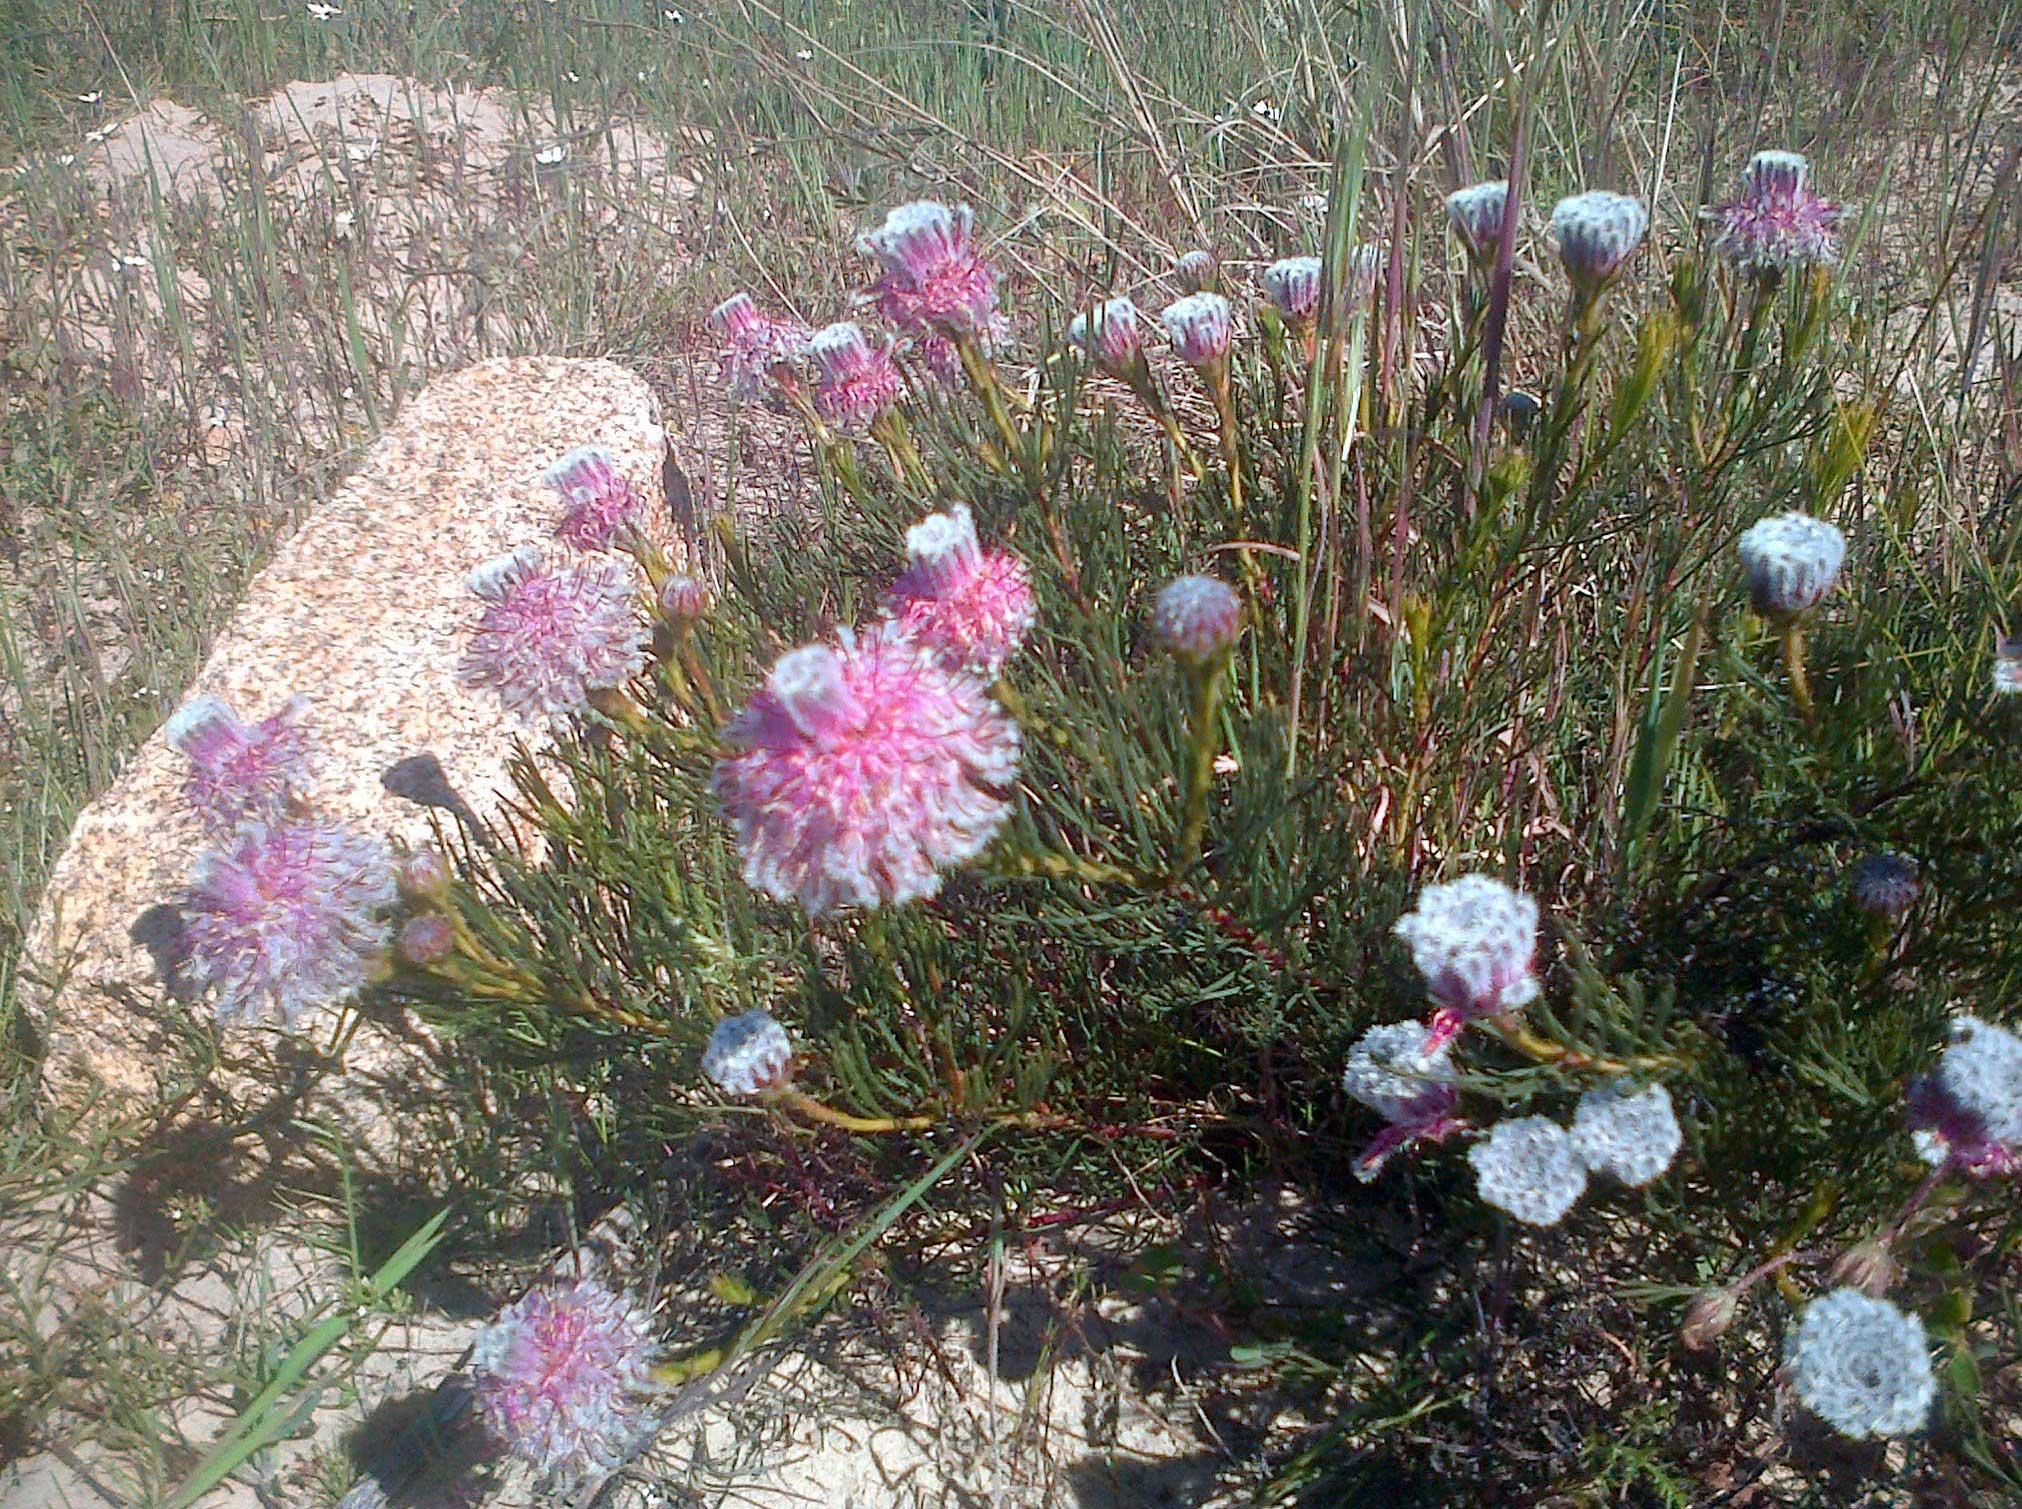 serruria-furcellata-bracken-nr-2_web